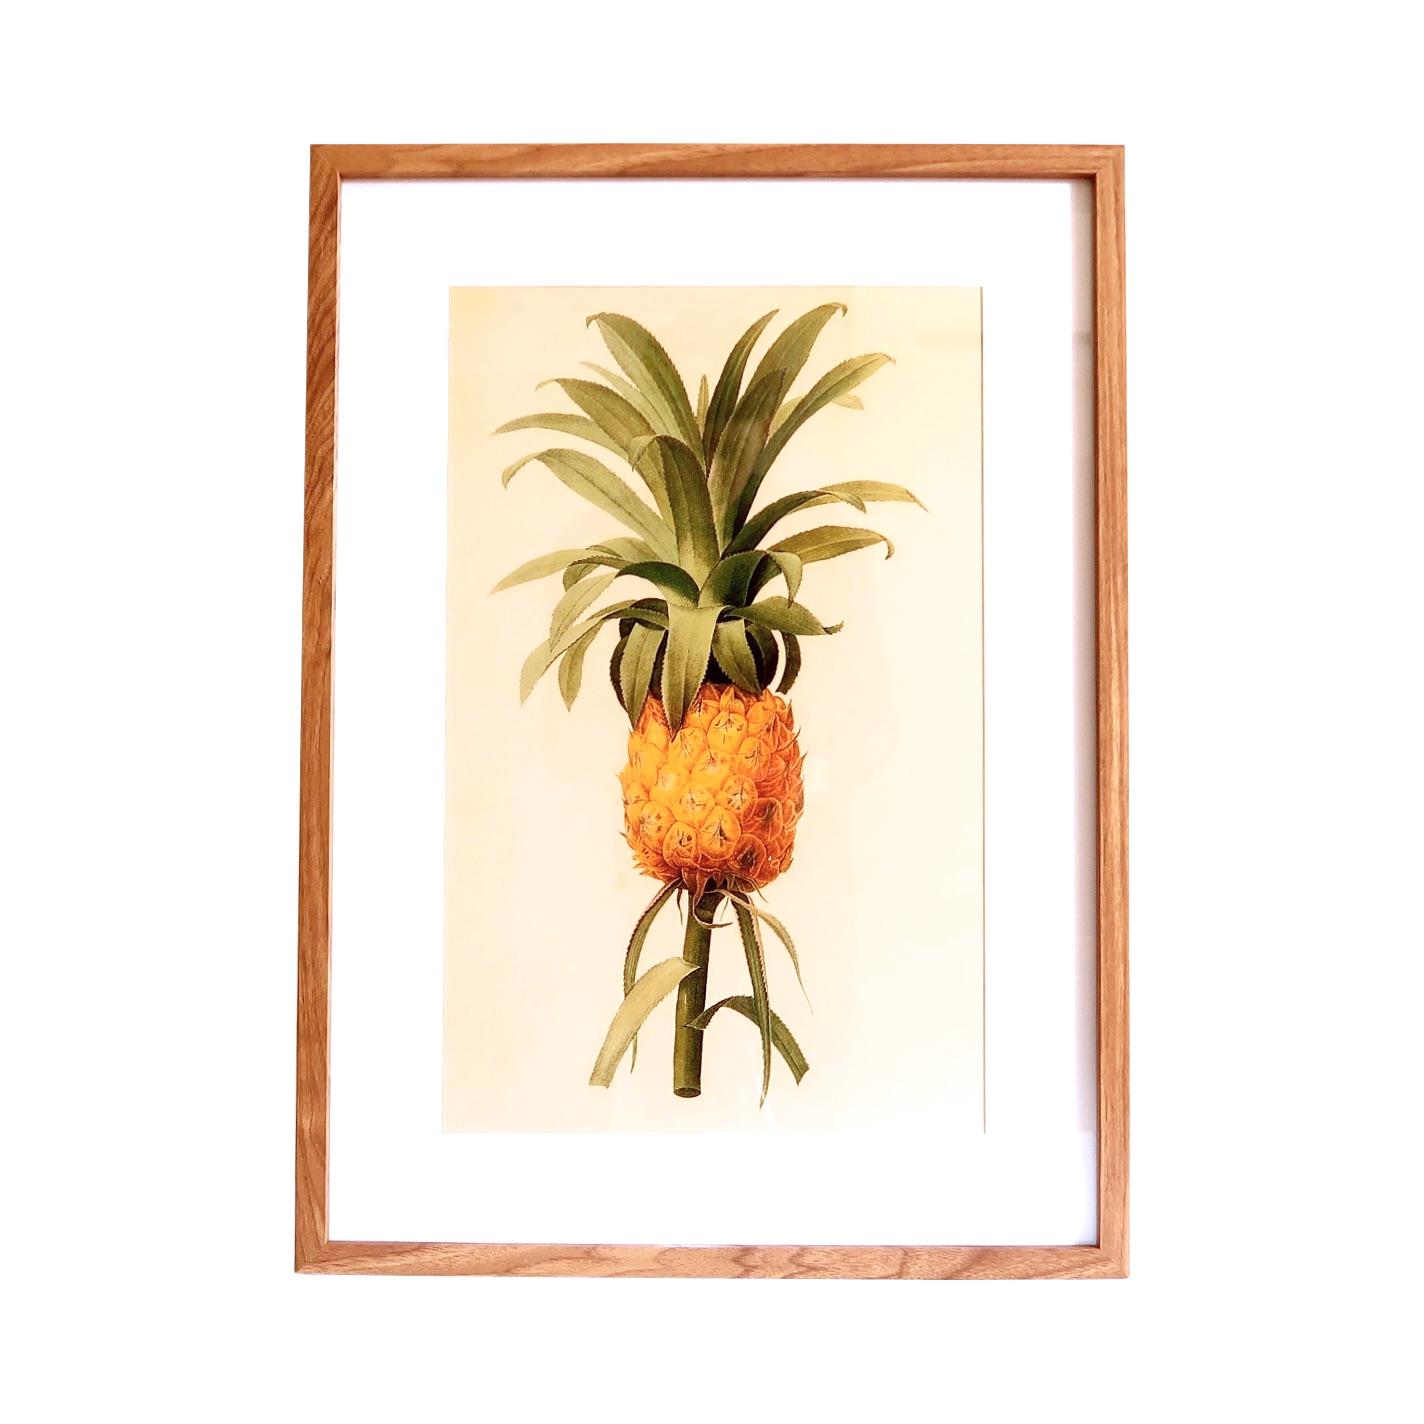 Nytt Bilde med ramme - Vintage ananas - Palma store VJ-97